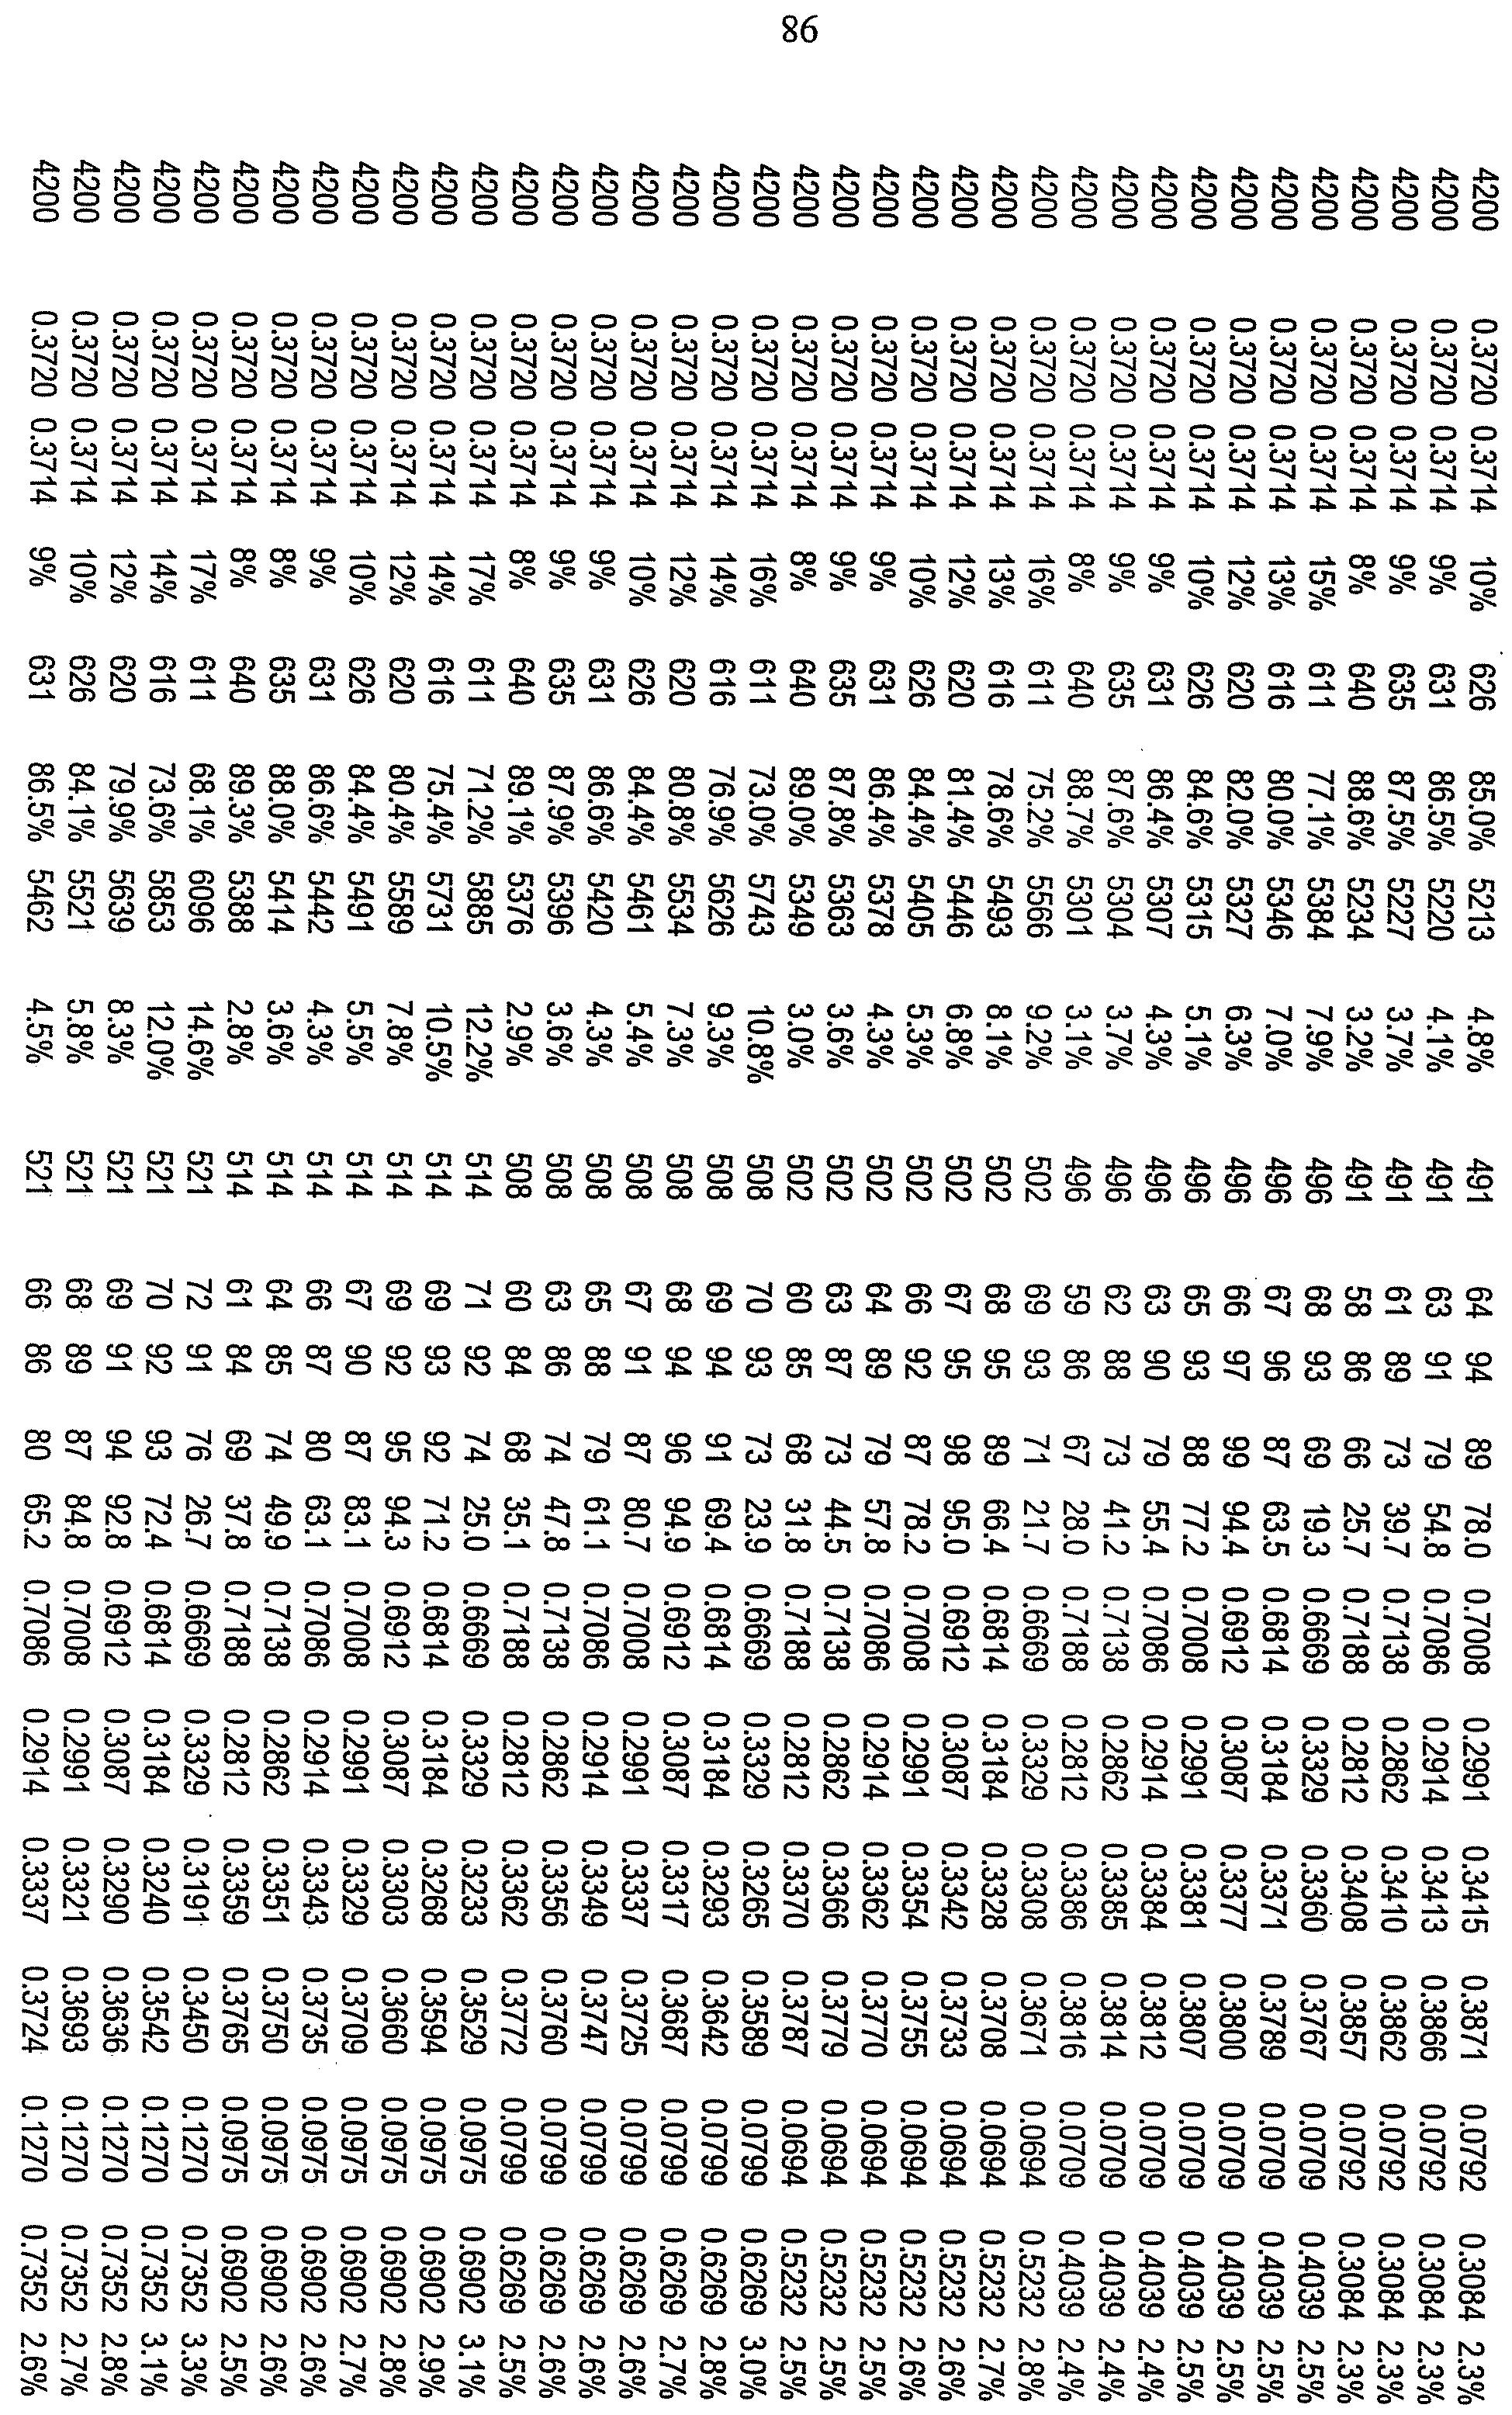 Figure 112010029469117-pct00064